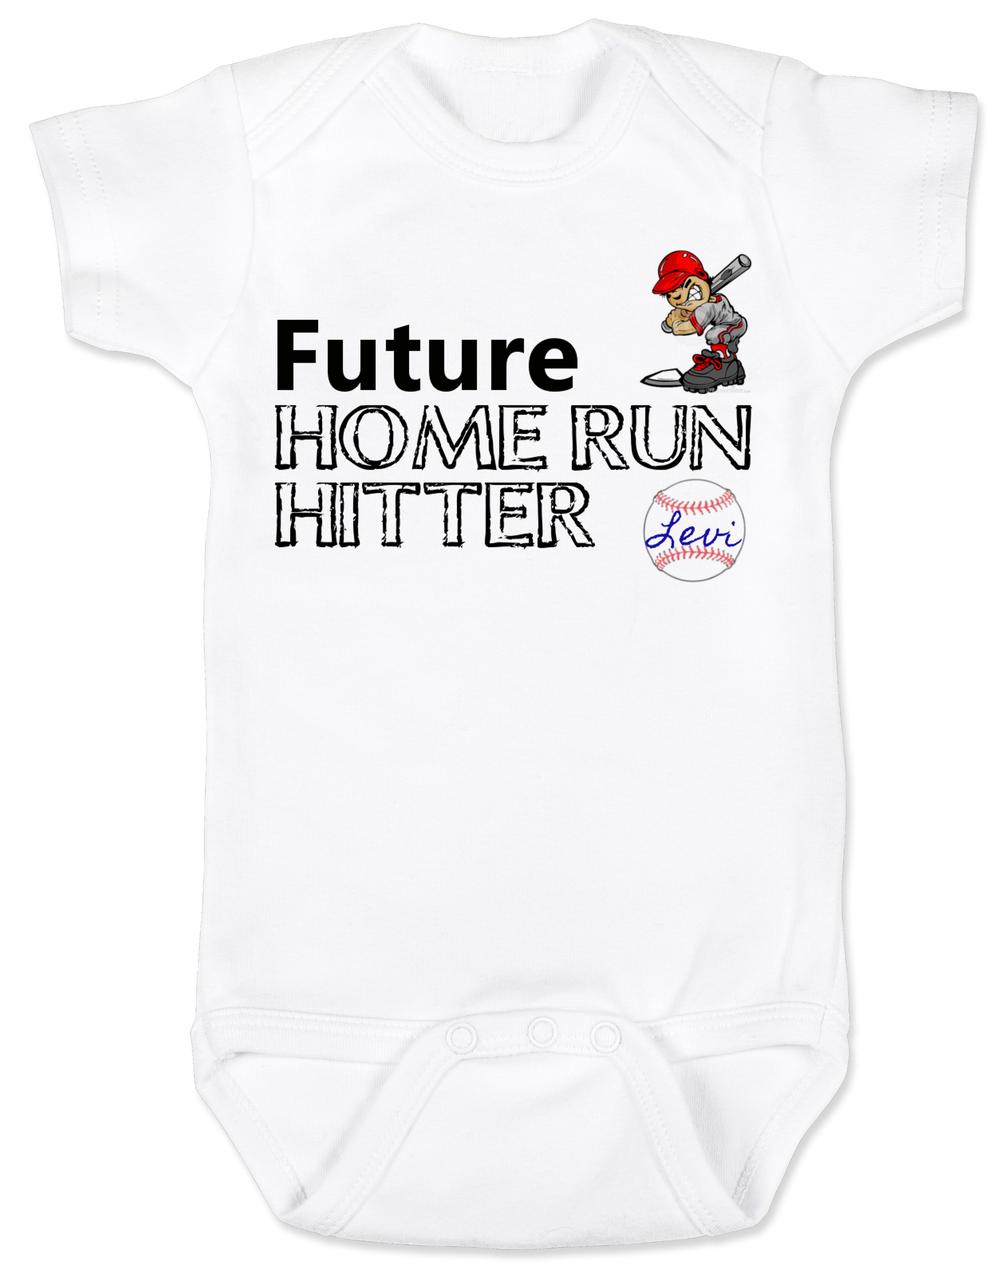 144564fc0 Future Home Run Hitter baby boy Bodysuit, Future Baseball Player, Play  Ball, Baseball